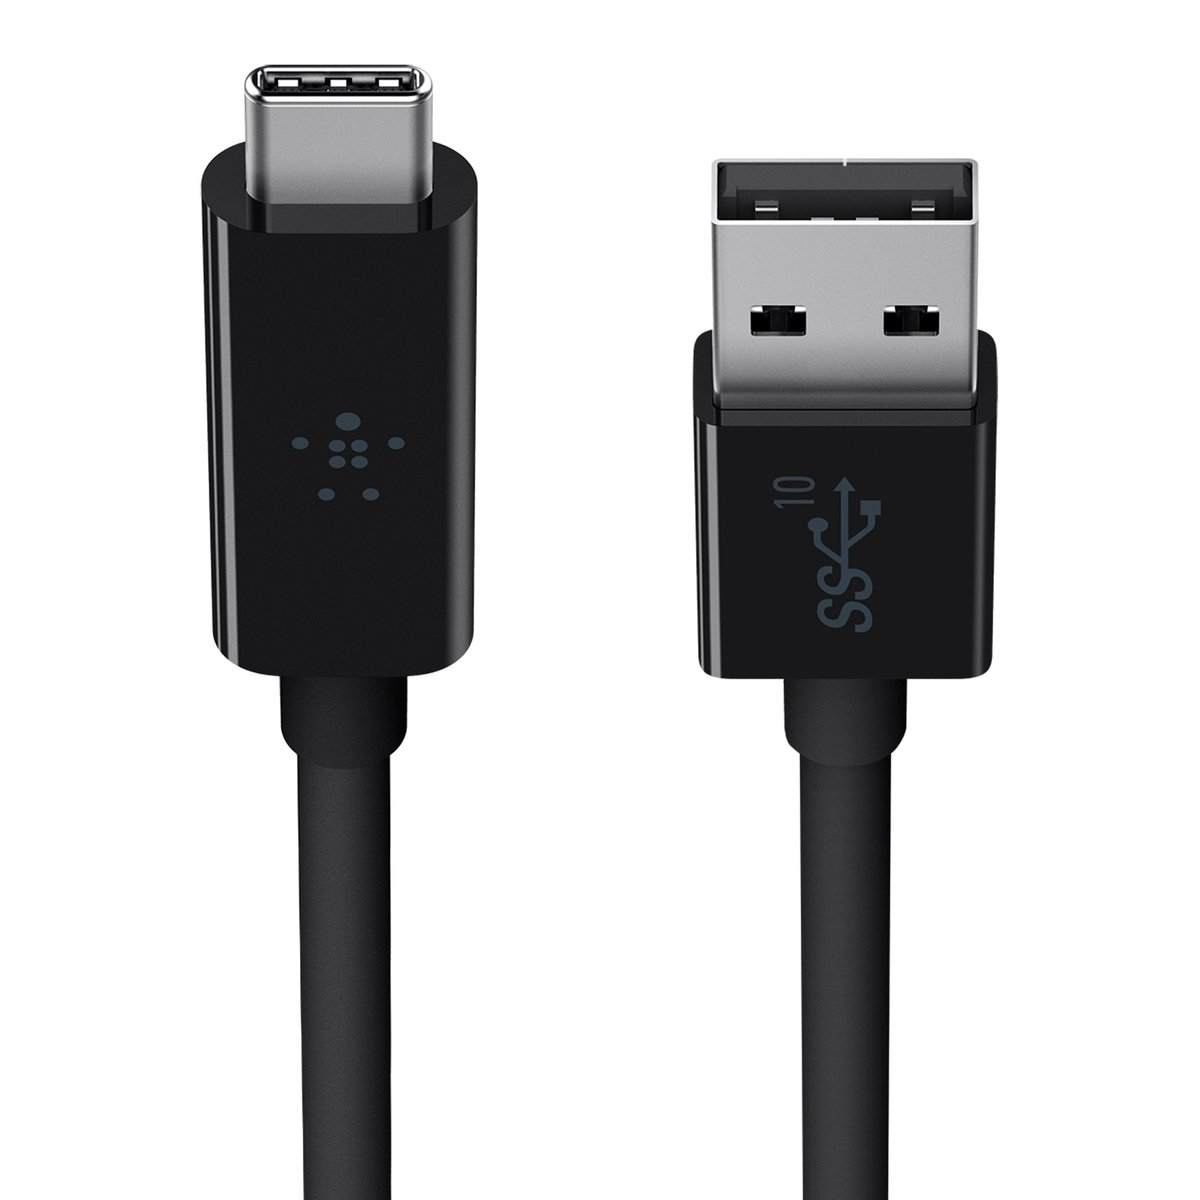 USB 3.1 USB-C 轉 USB-A 線纜 (USBIF 認證)